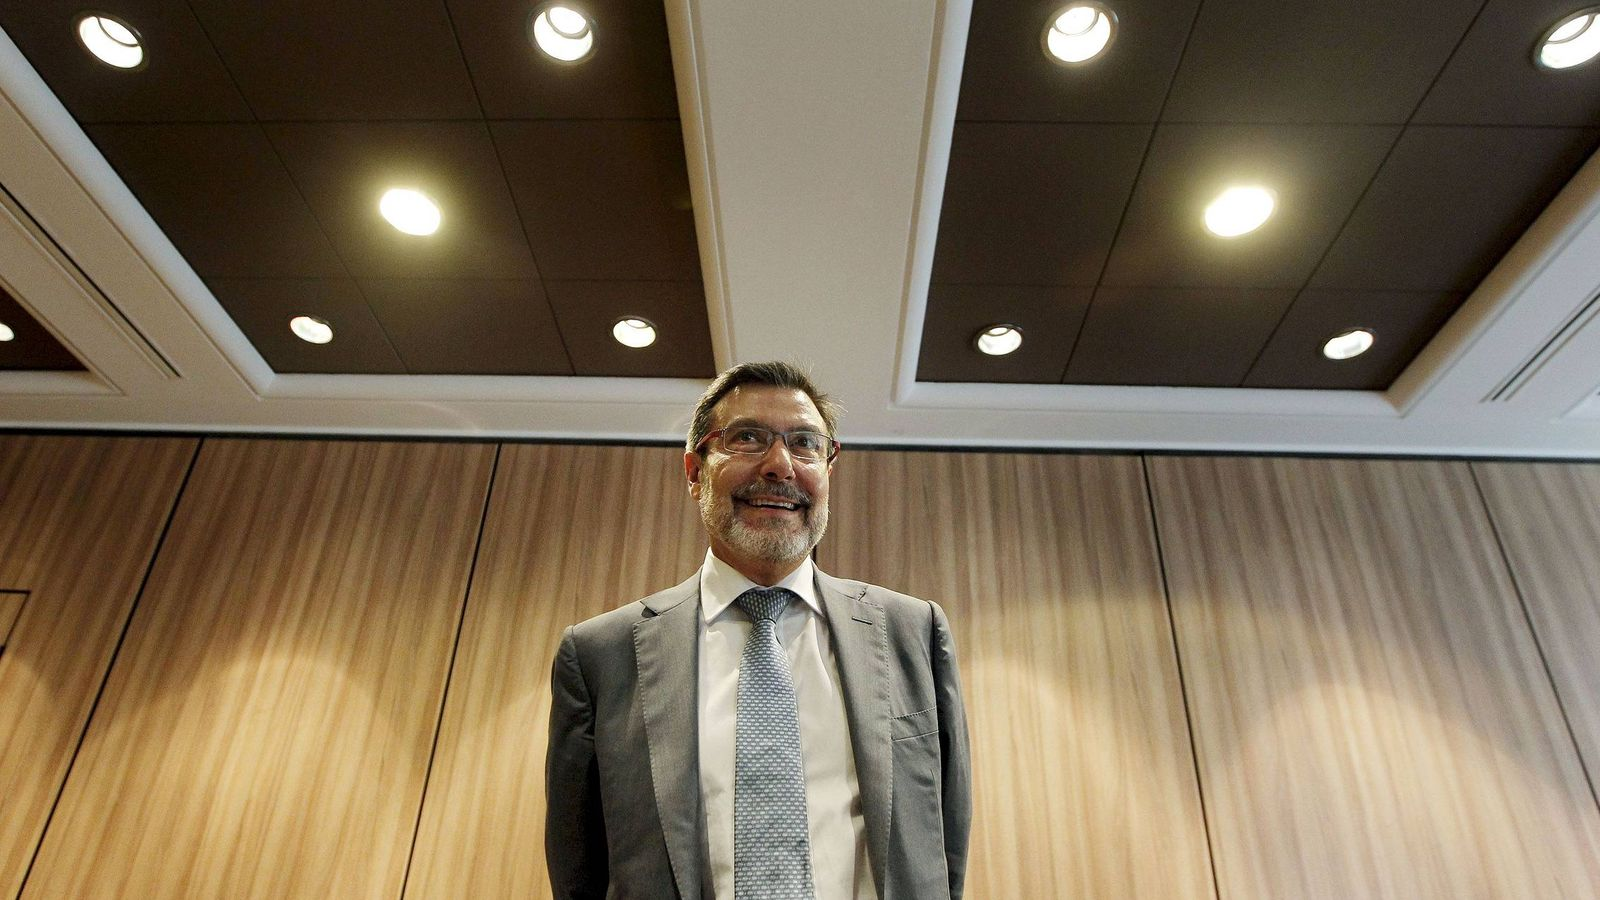 Antoni asunci n el ministro del interior que supo dimitir for Ministro de interior espana